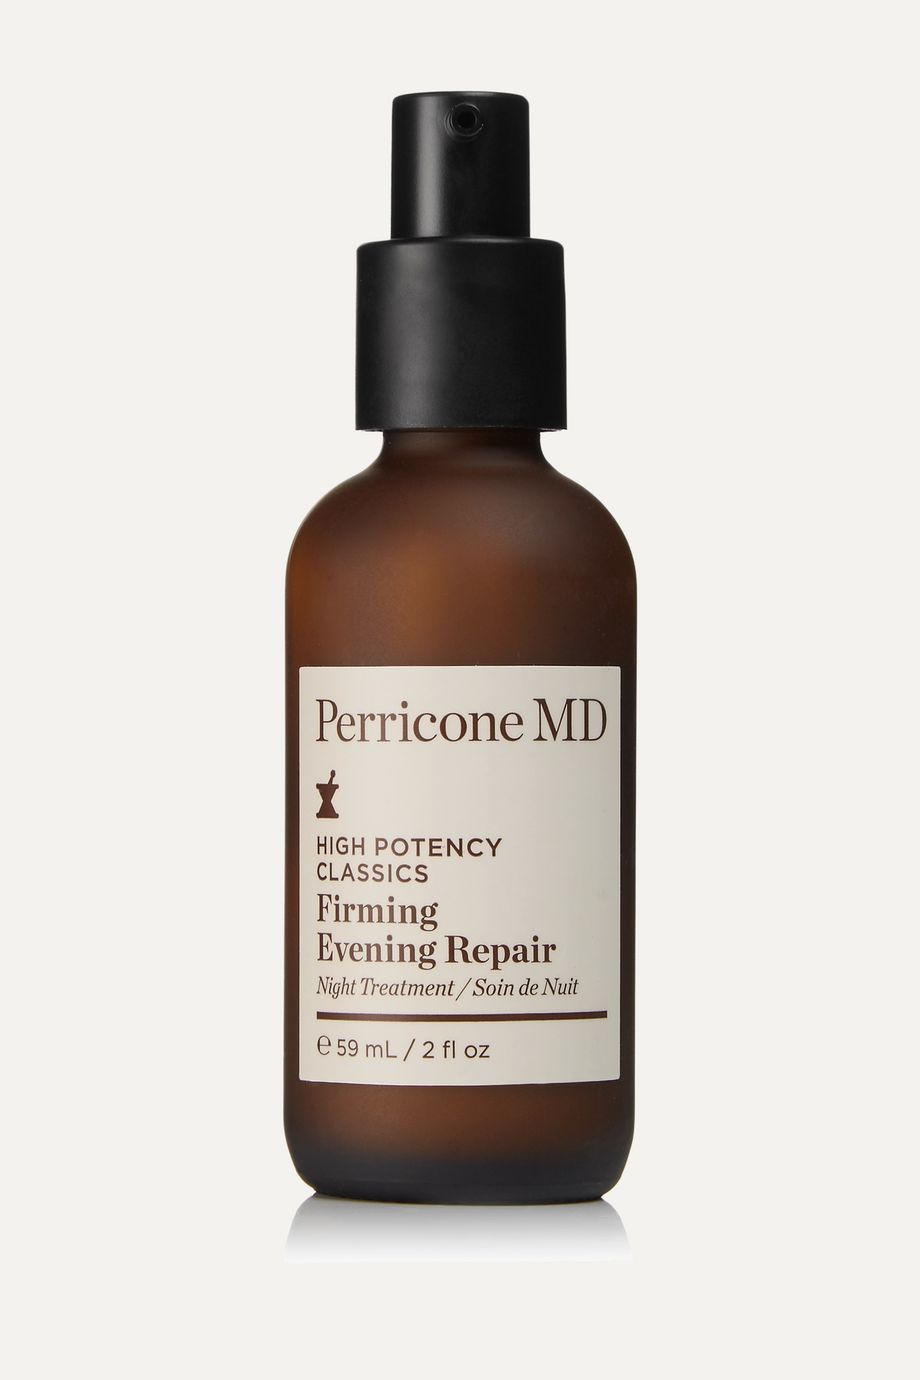 Perricone MD High Potency Classics Firming Evening Repair, 59ml